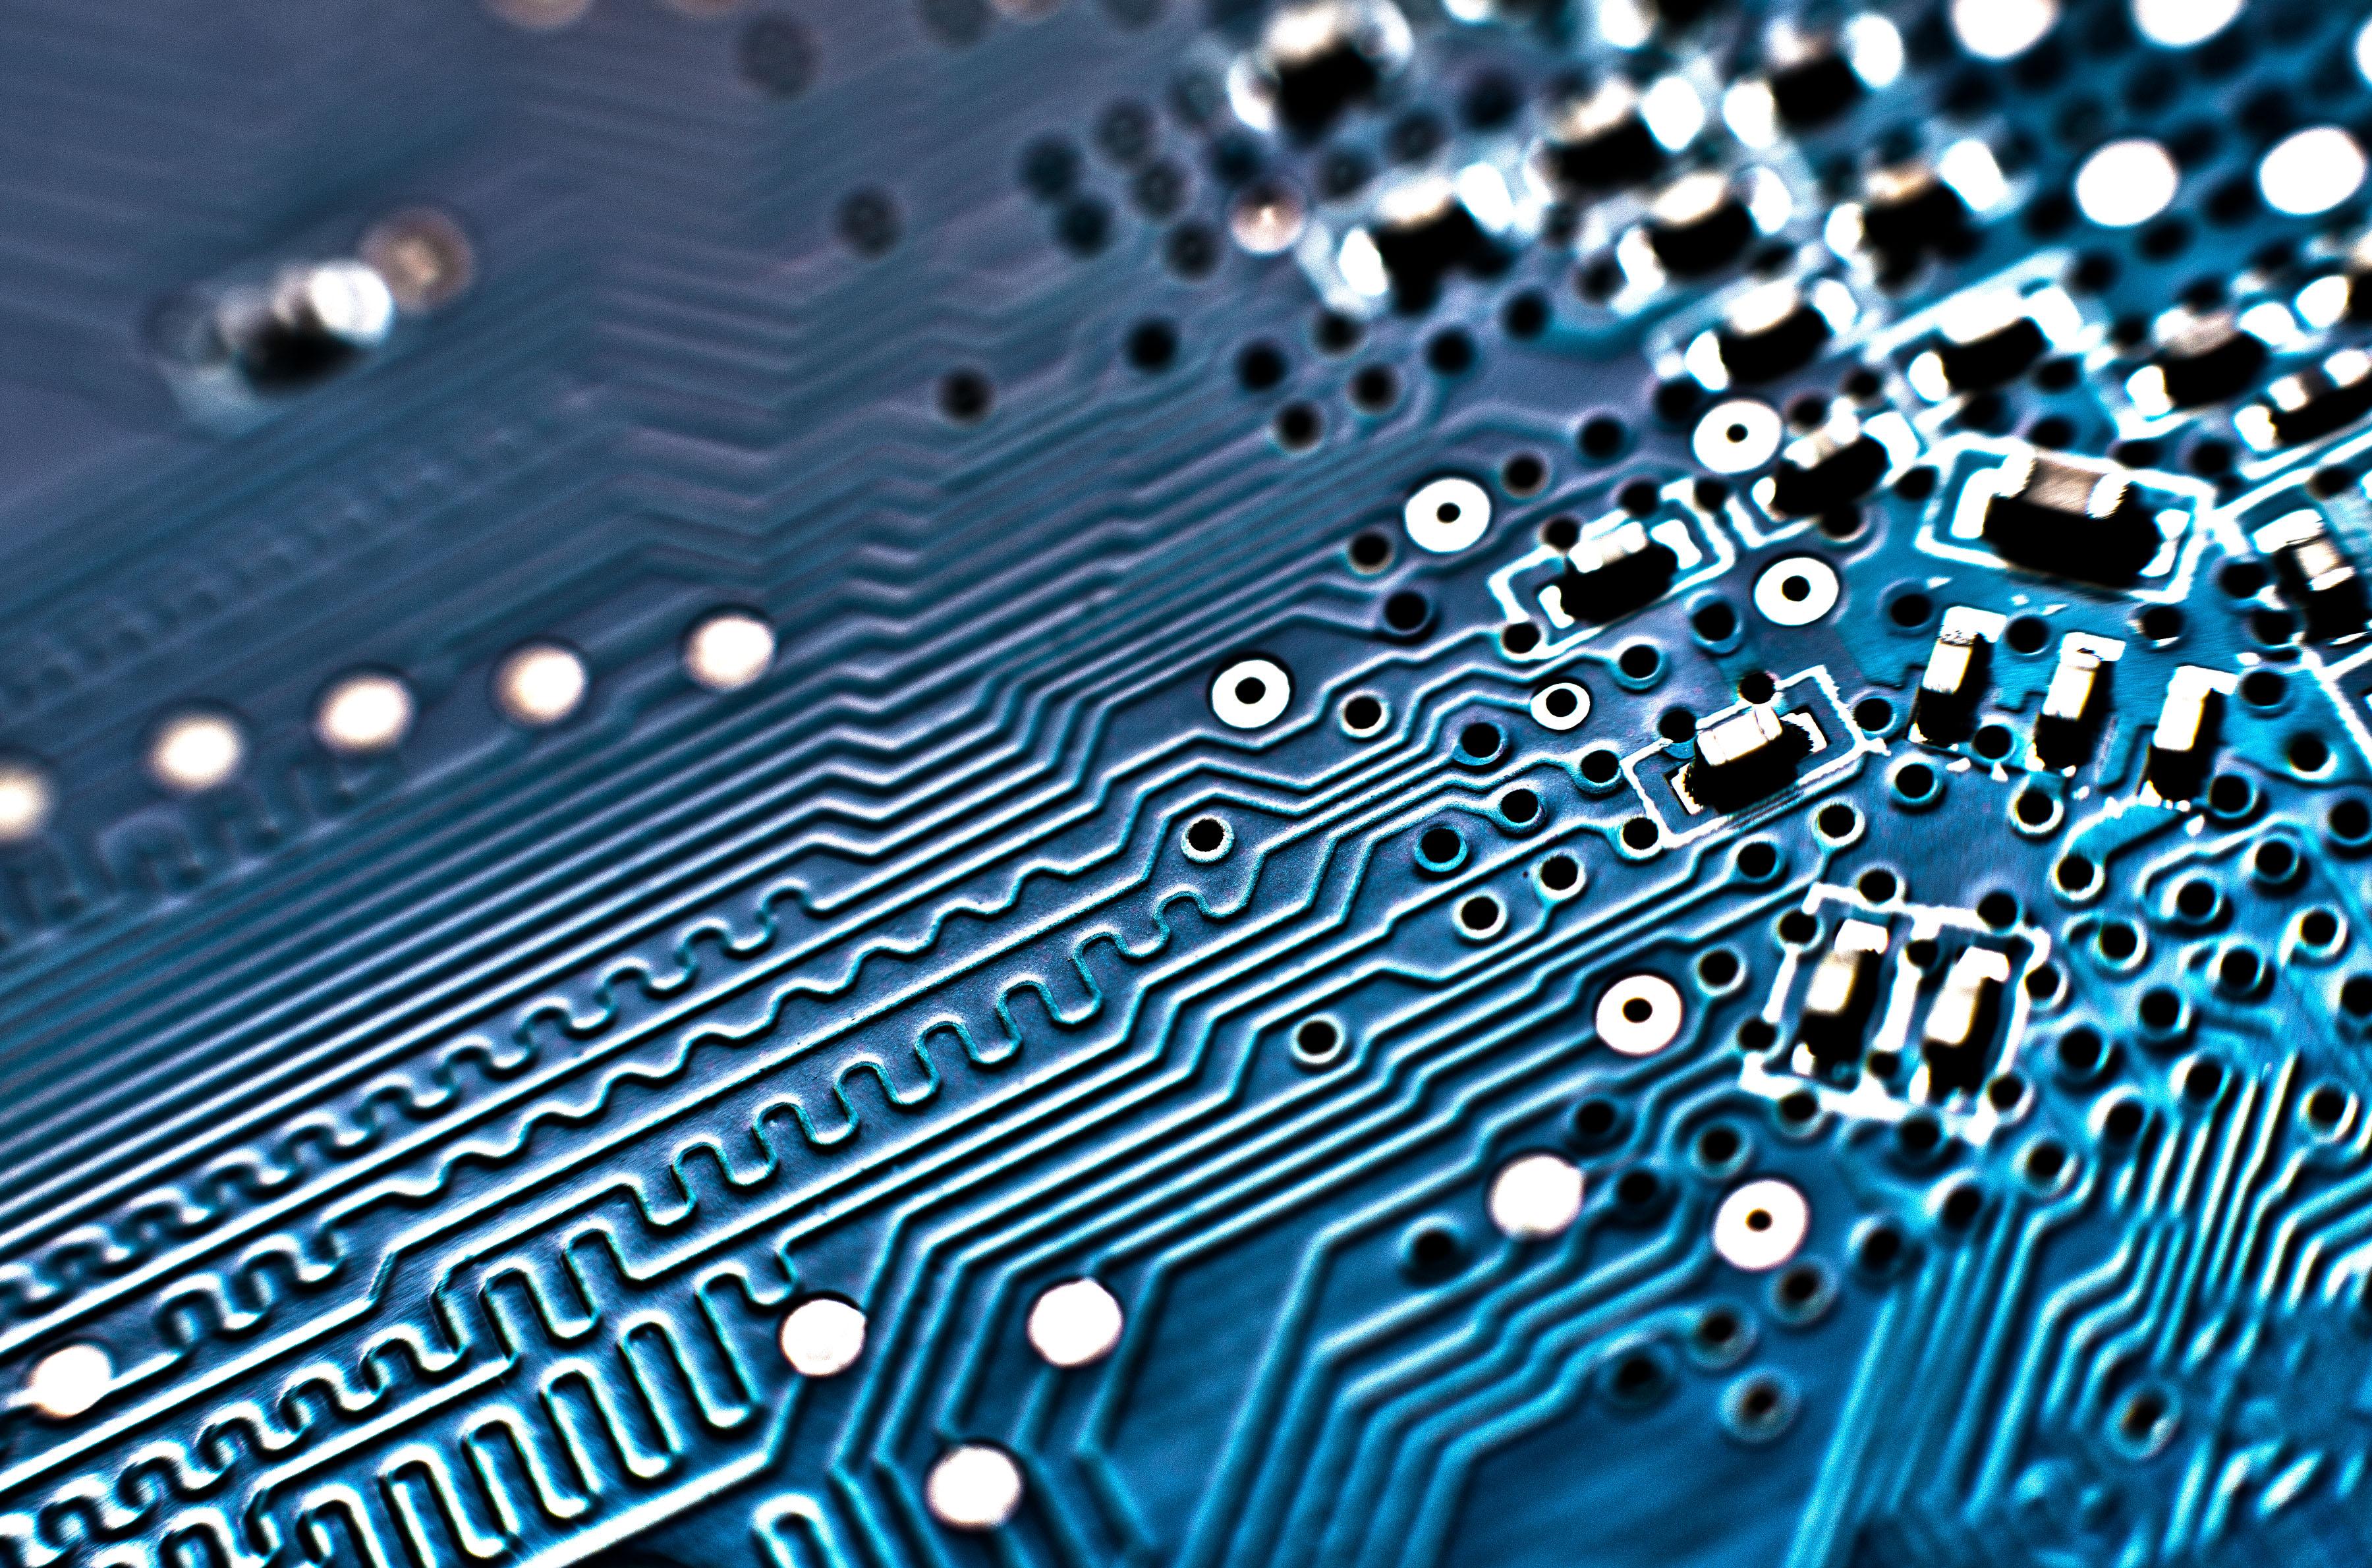 File:Computer Circuit Board MOD 45153623.jpg - Wikimedia Commons